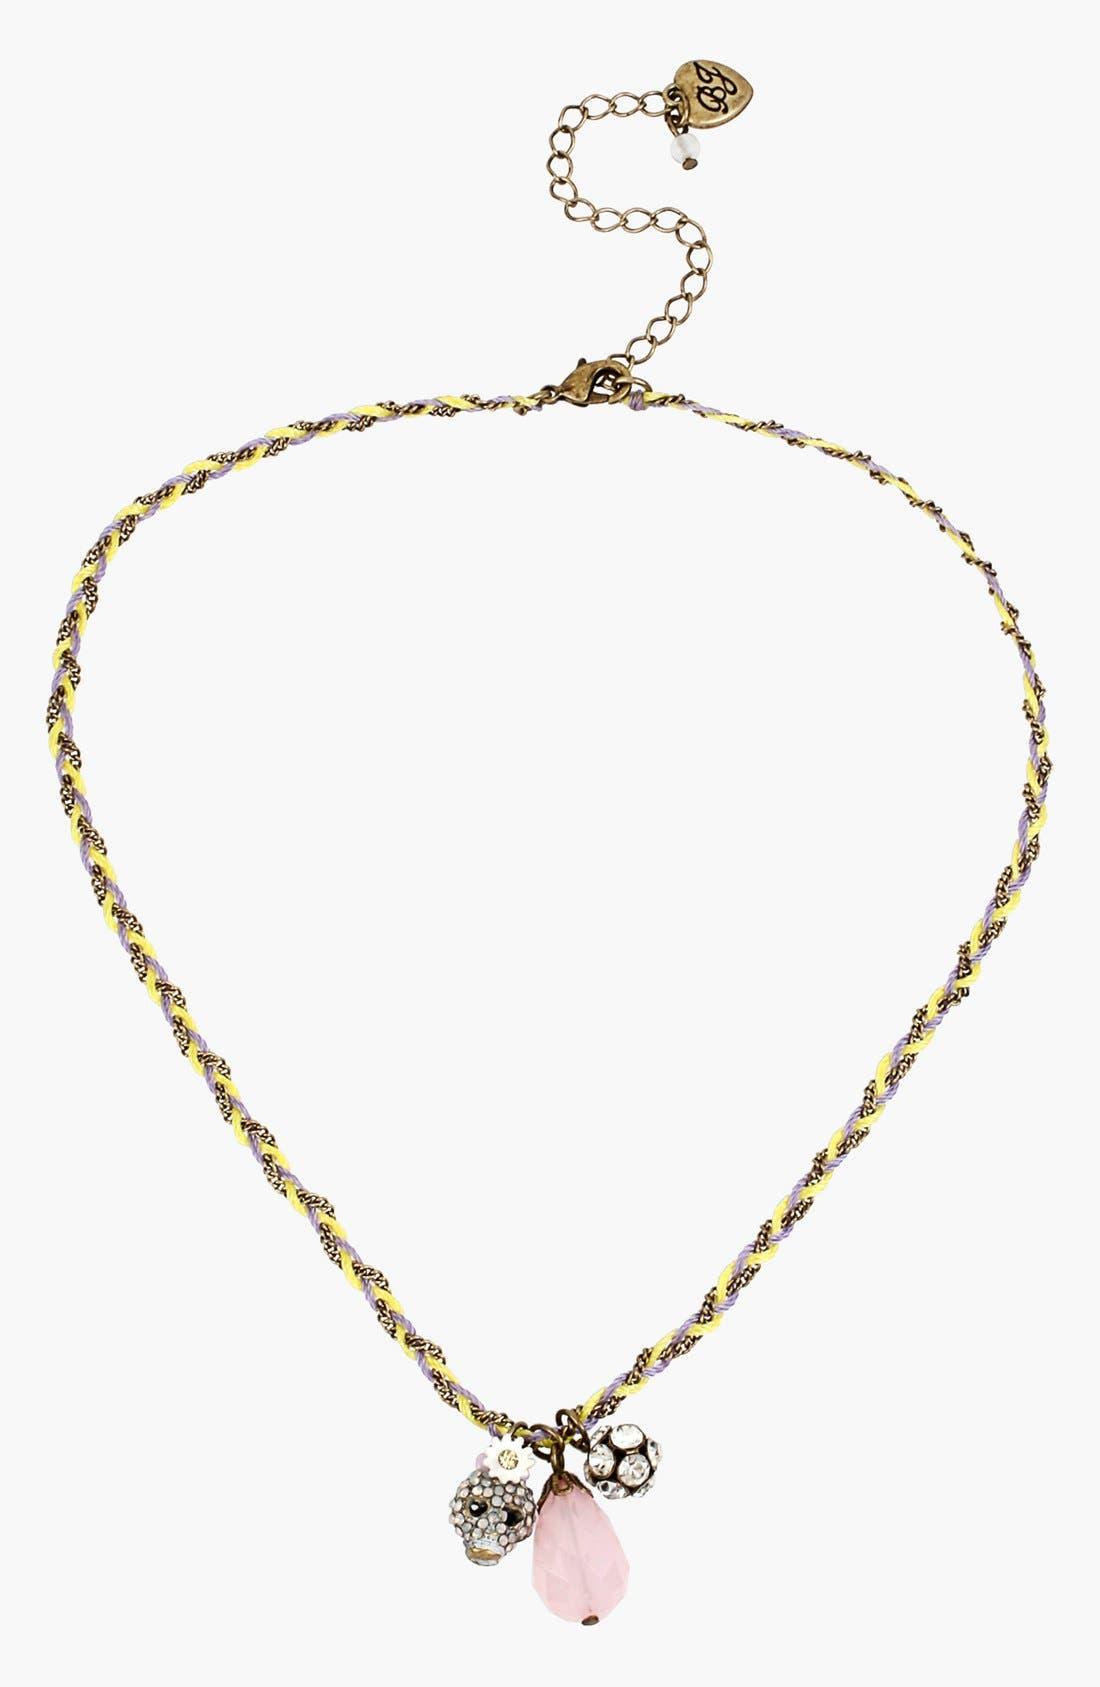 Alternate Image 1 Selected - Betsey Johnson 'Girlie Grunge' Cluster Pendant Necklace